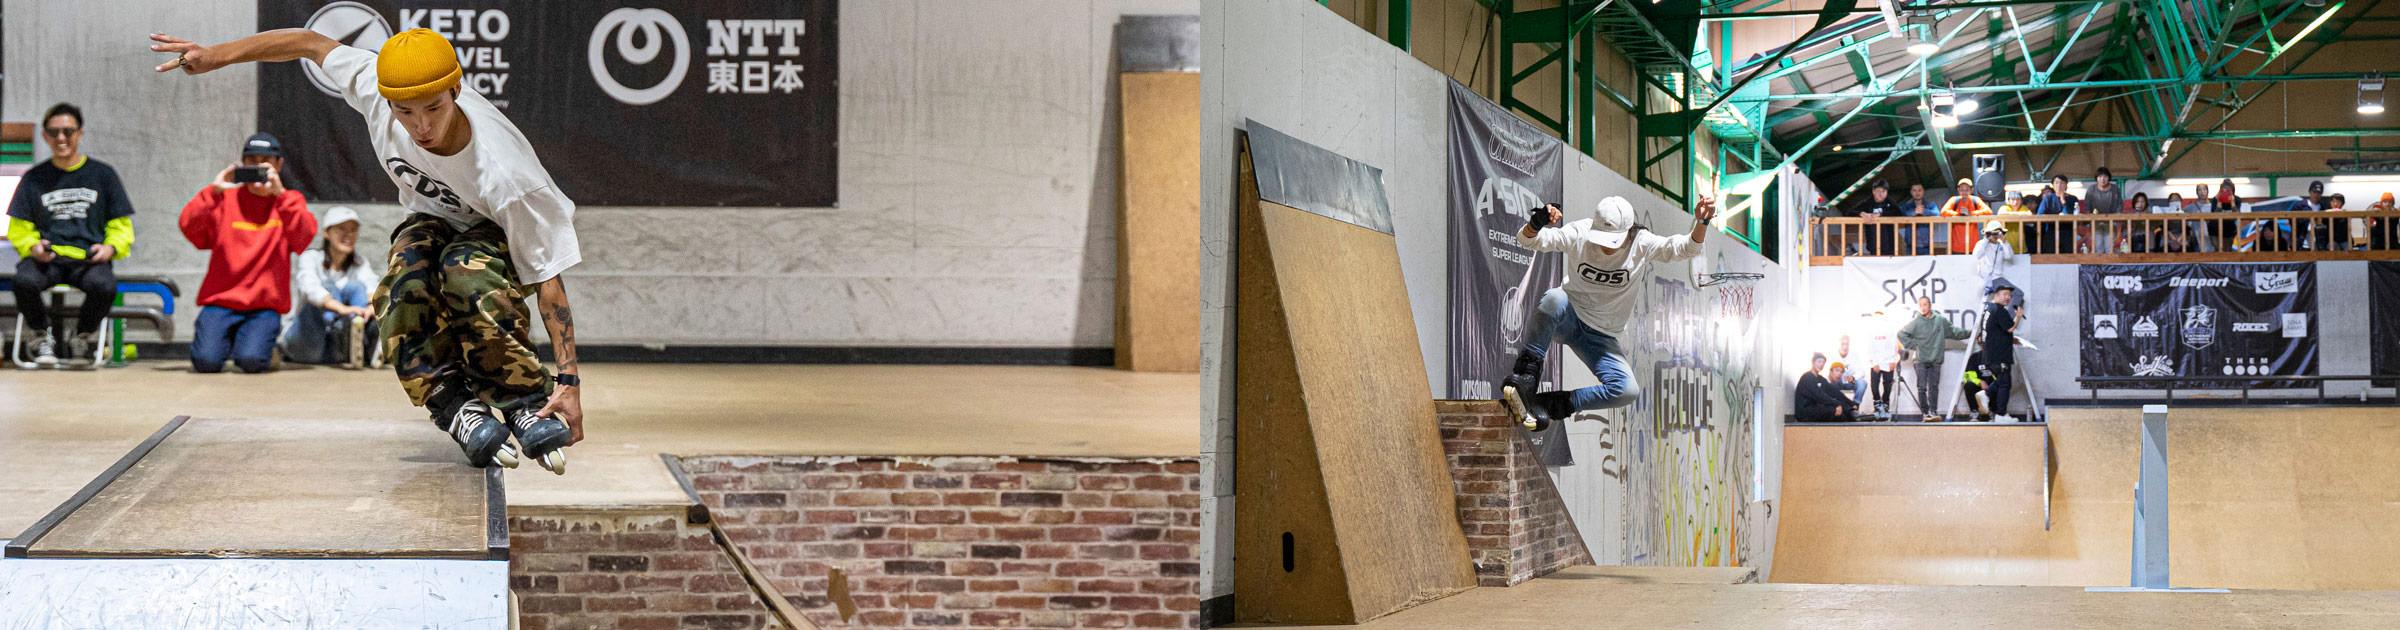 CHIMERA-A-SIDEの3rdLEAGUE-2019のReport メイン画像:Inline Skate インラインスケート